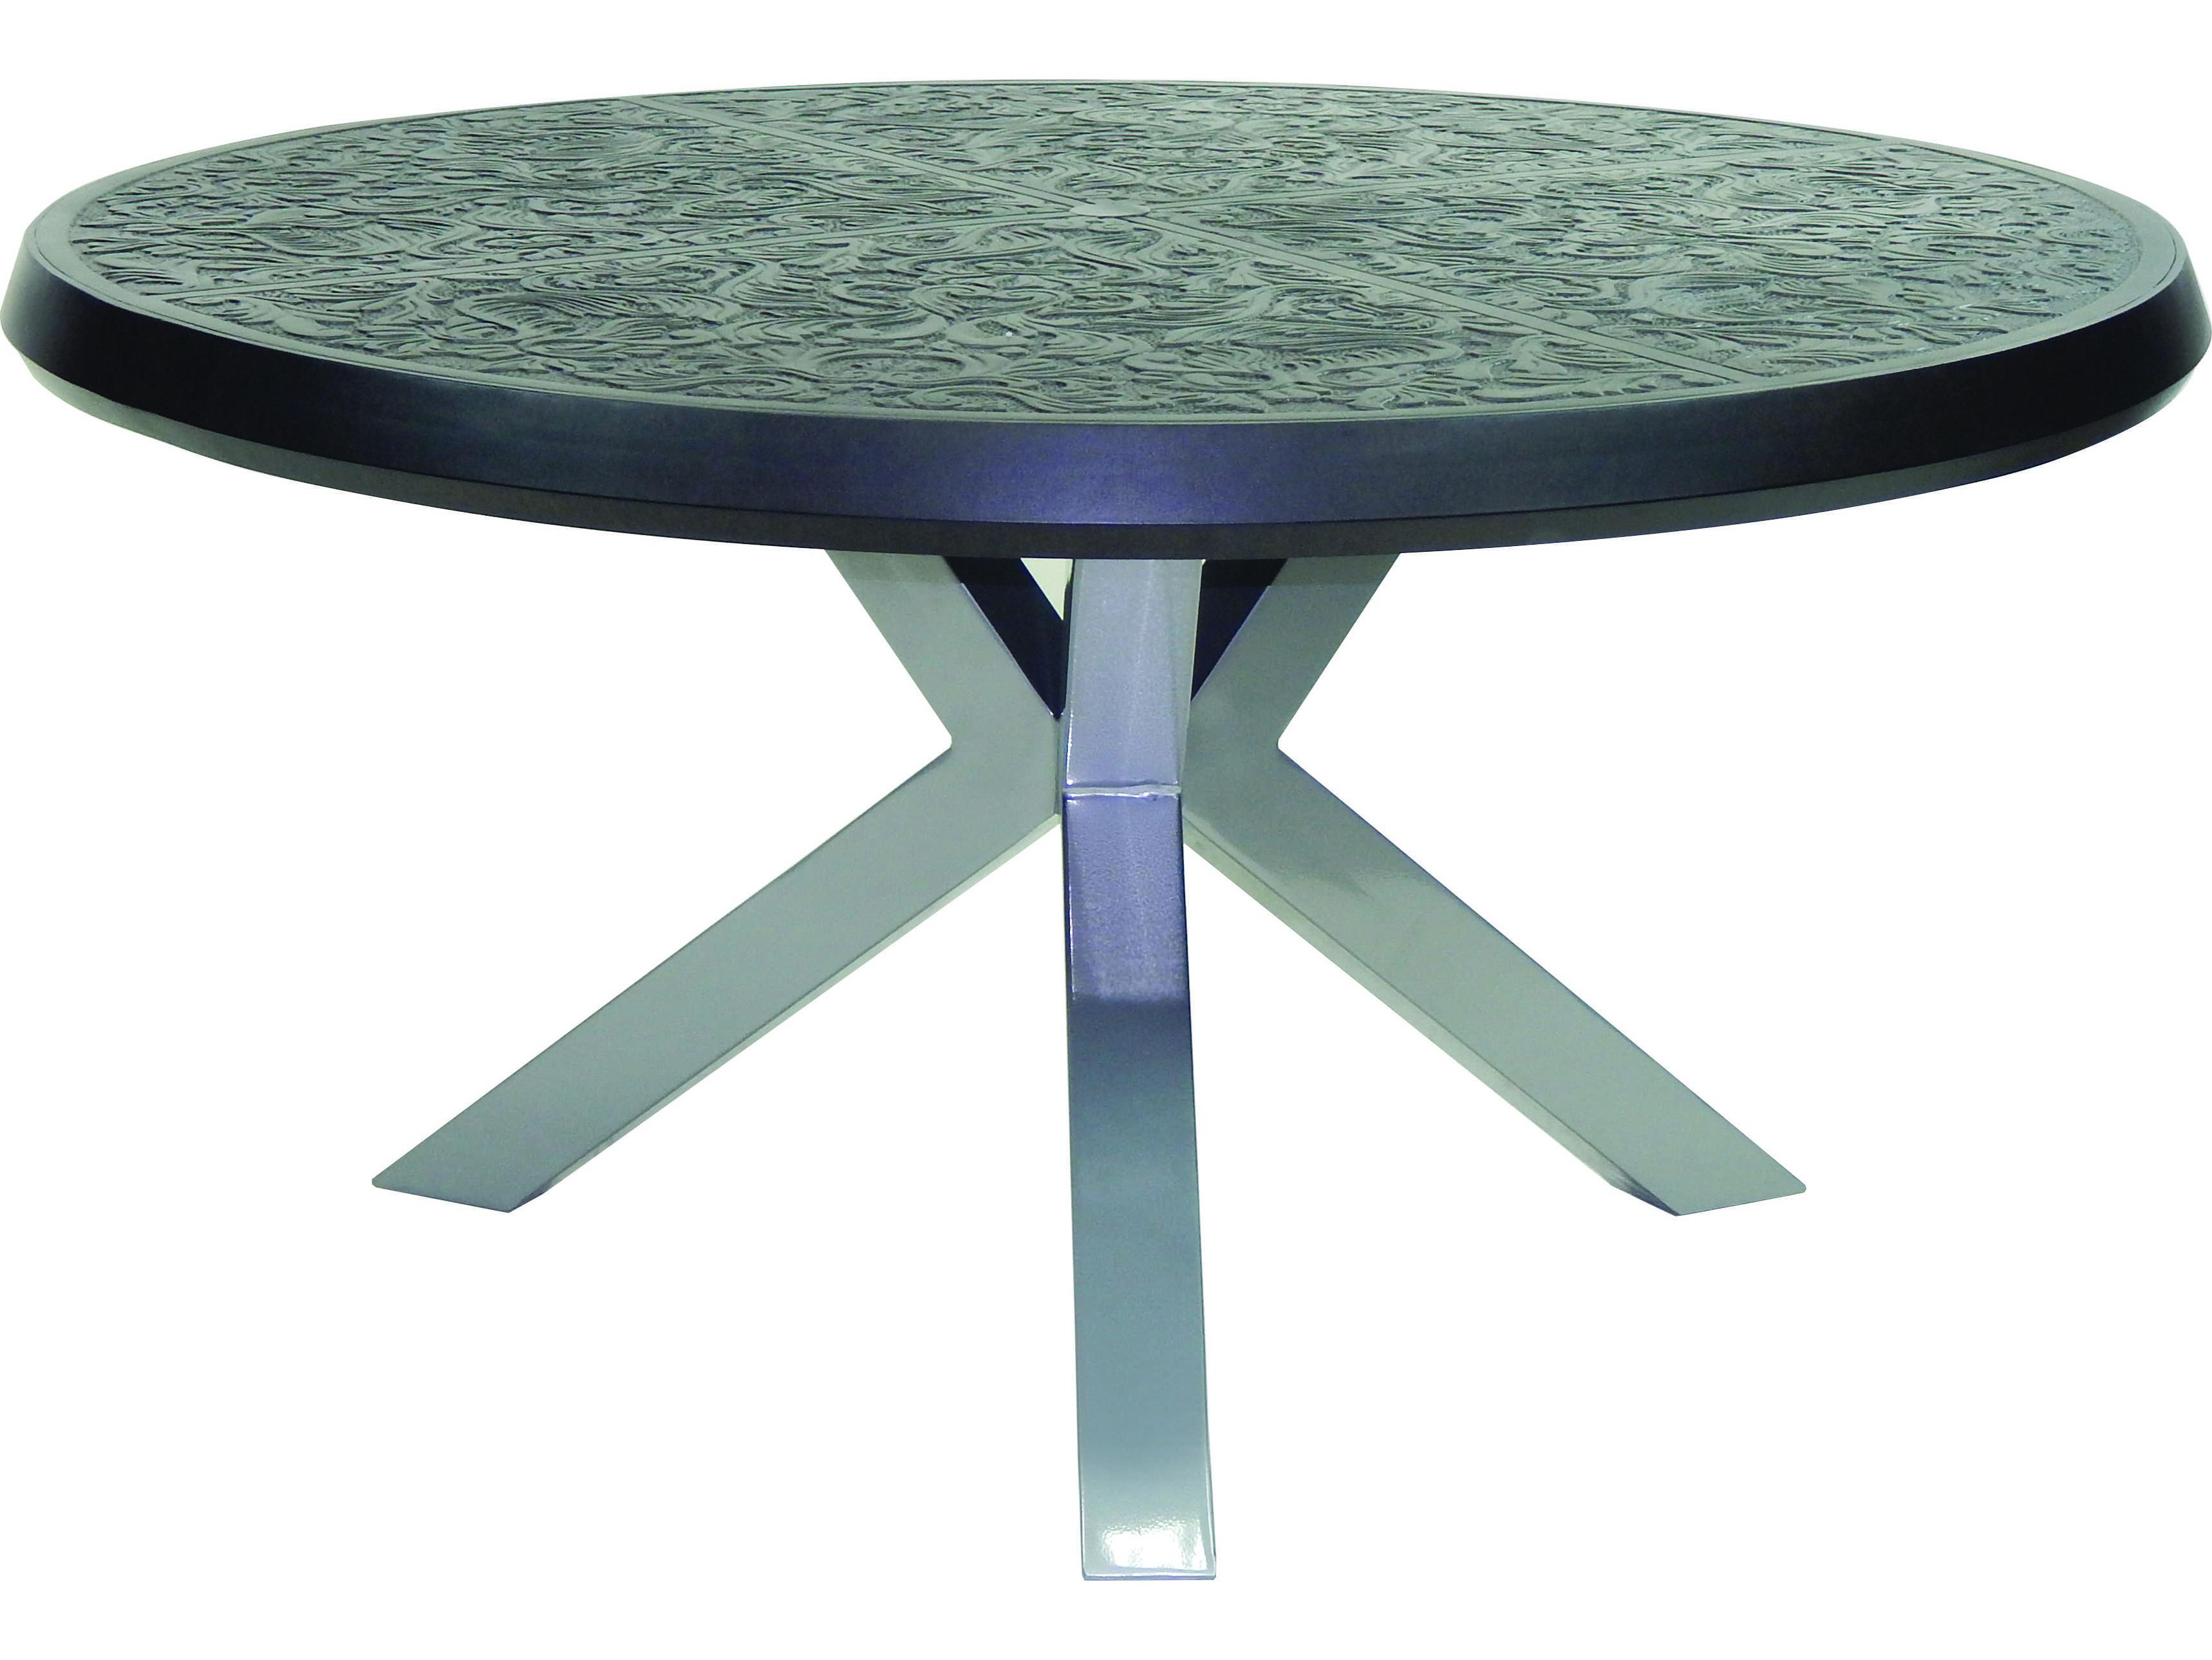 Castelle Altra Cast Aluminum 54 Round Dining Table TCG54